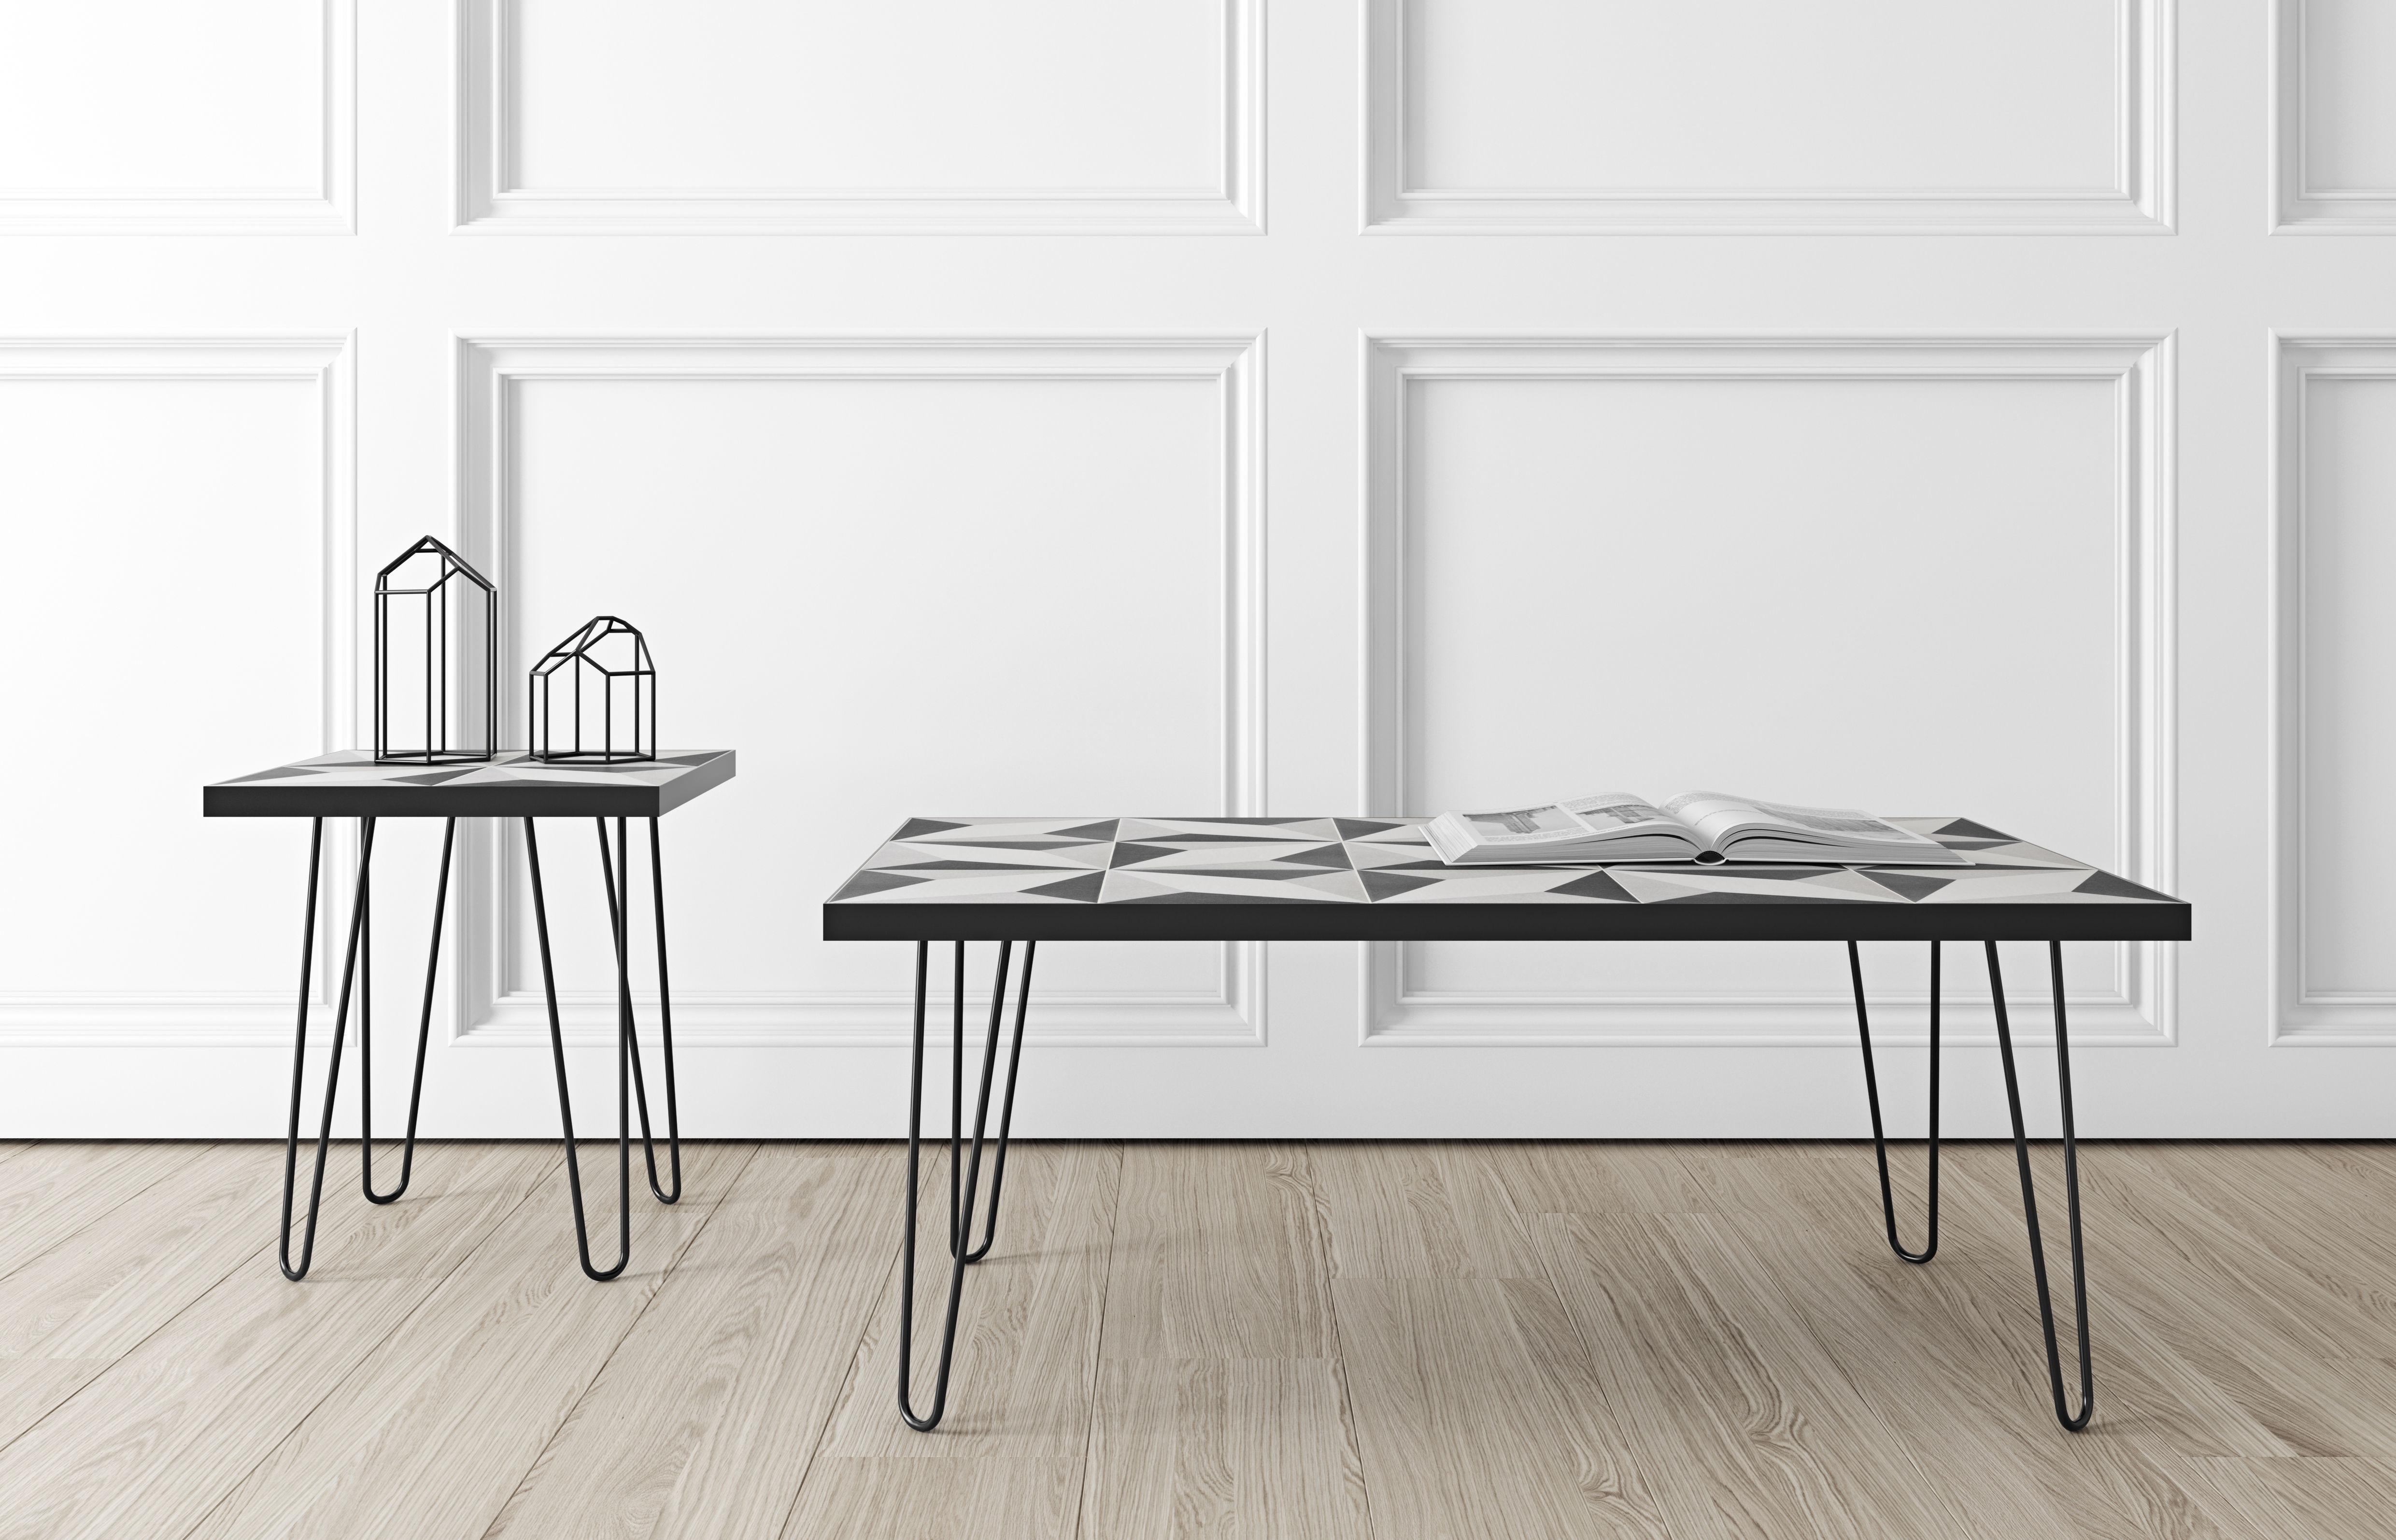 lisbonne keramik fliesen 100 x 60 cm pop up home couchtisch. Black Bedroom Furniture Sets. Home Design Ideas